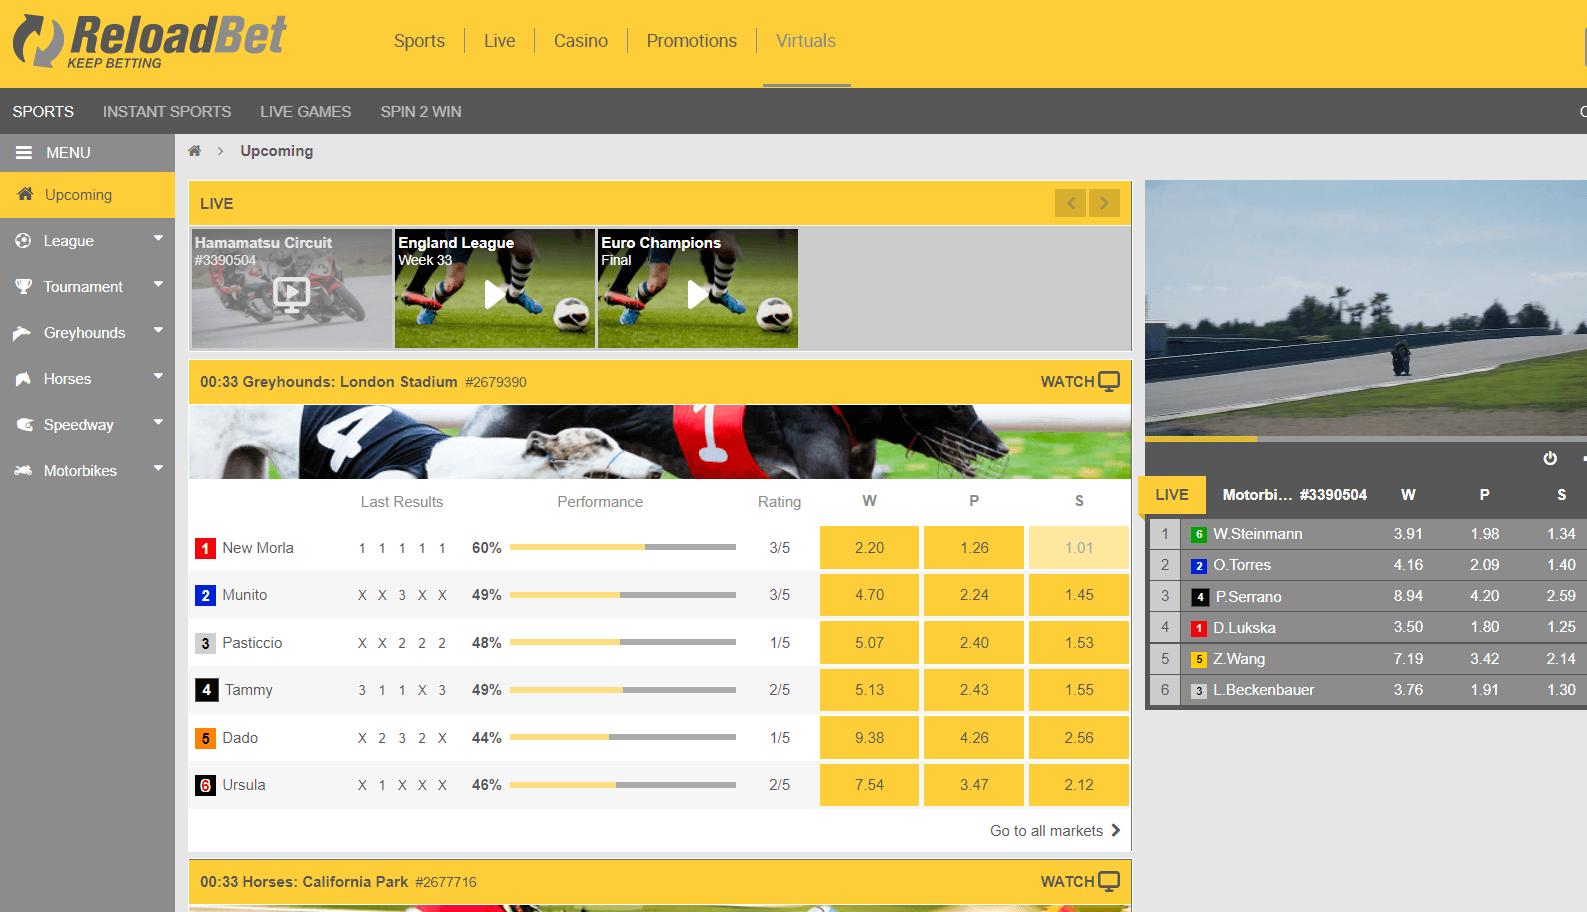 reload bet virtualni sportove-komarbet.com